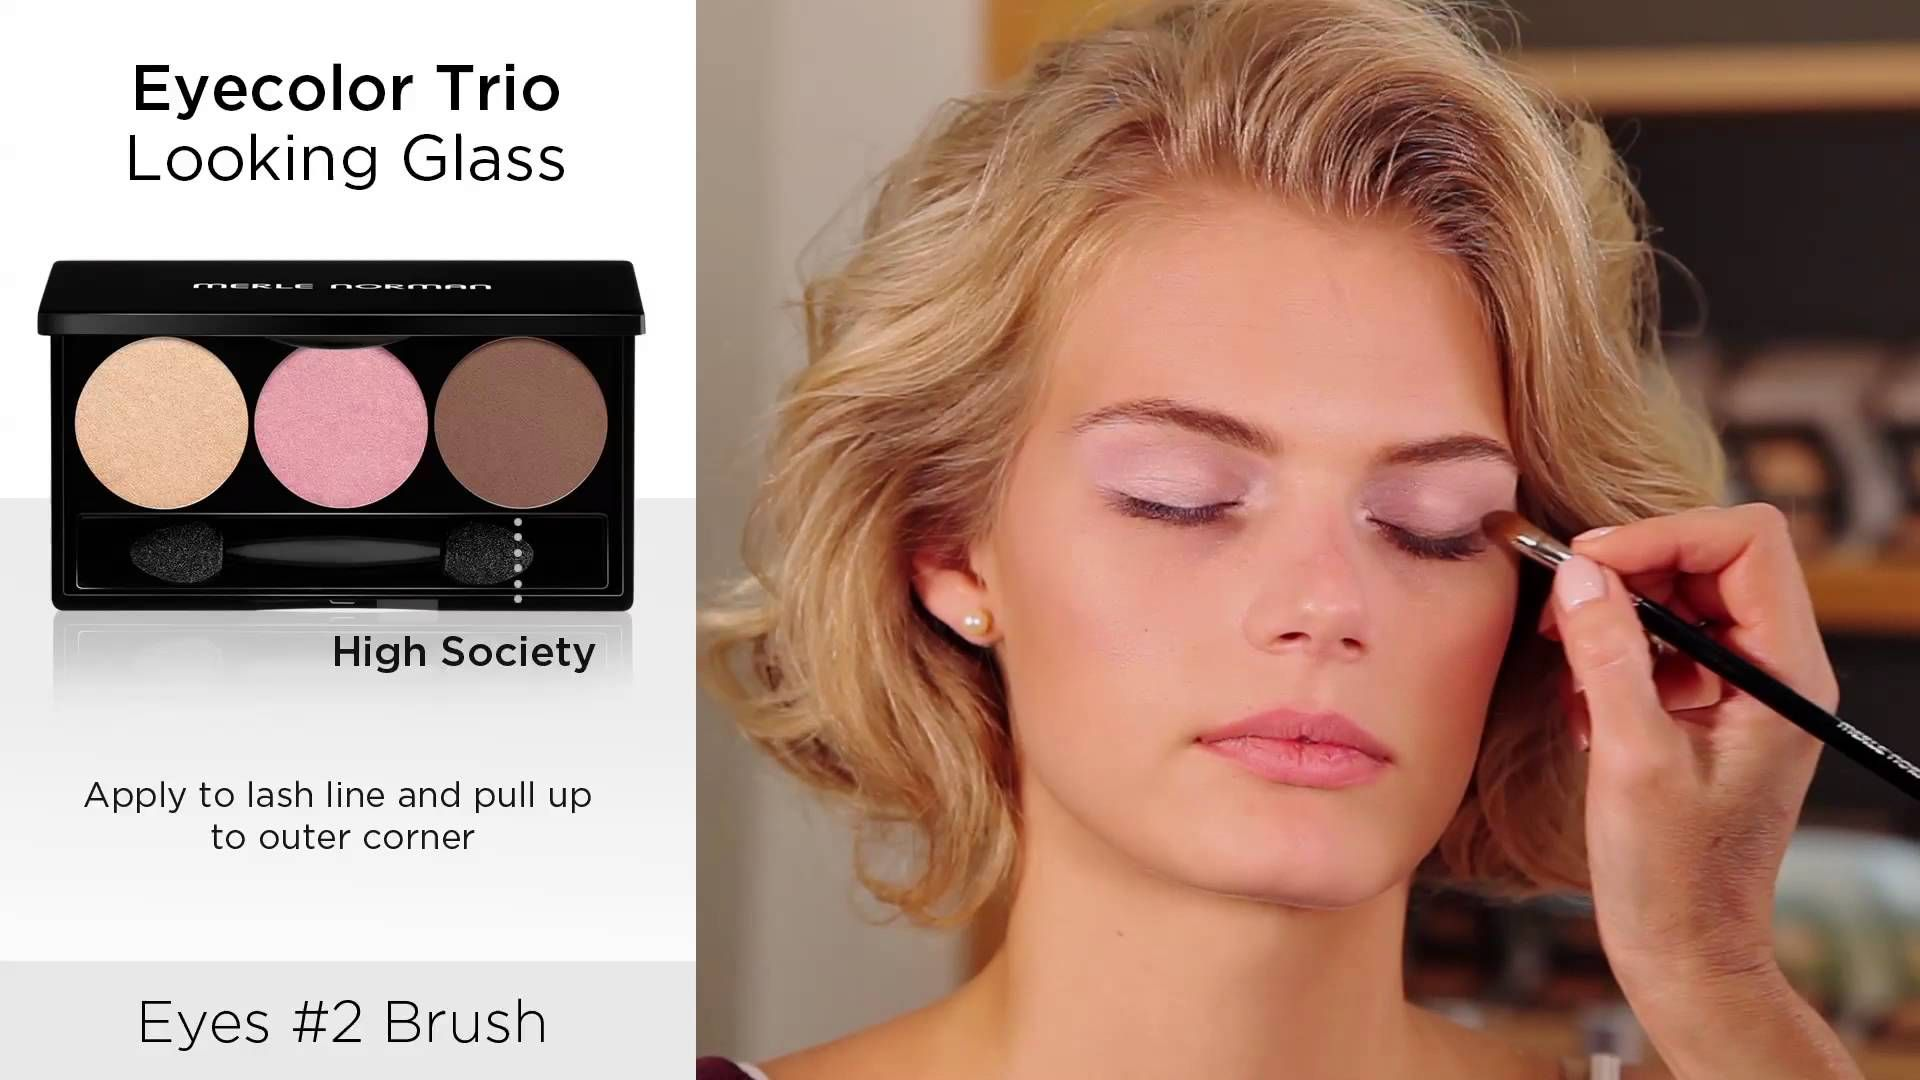 Merle Norman Cosmetics Spring 2014 Looking Glass Look